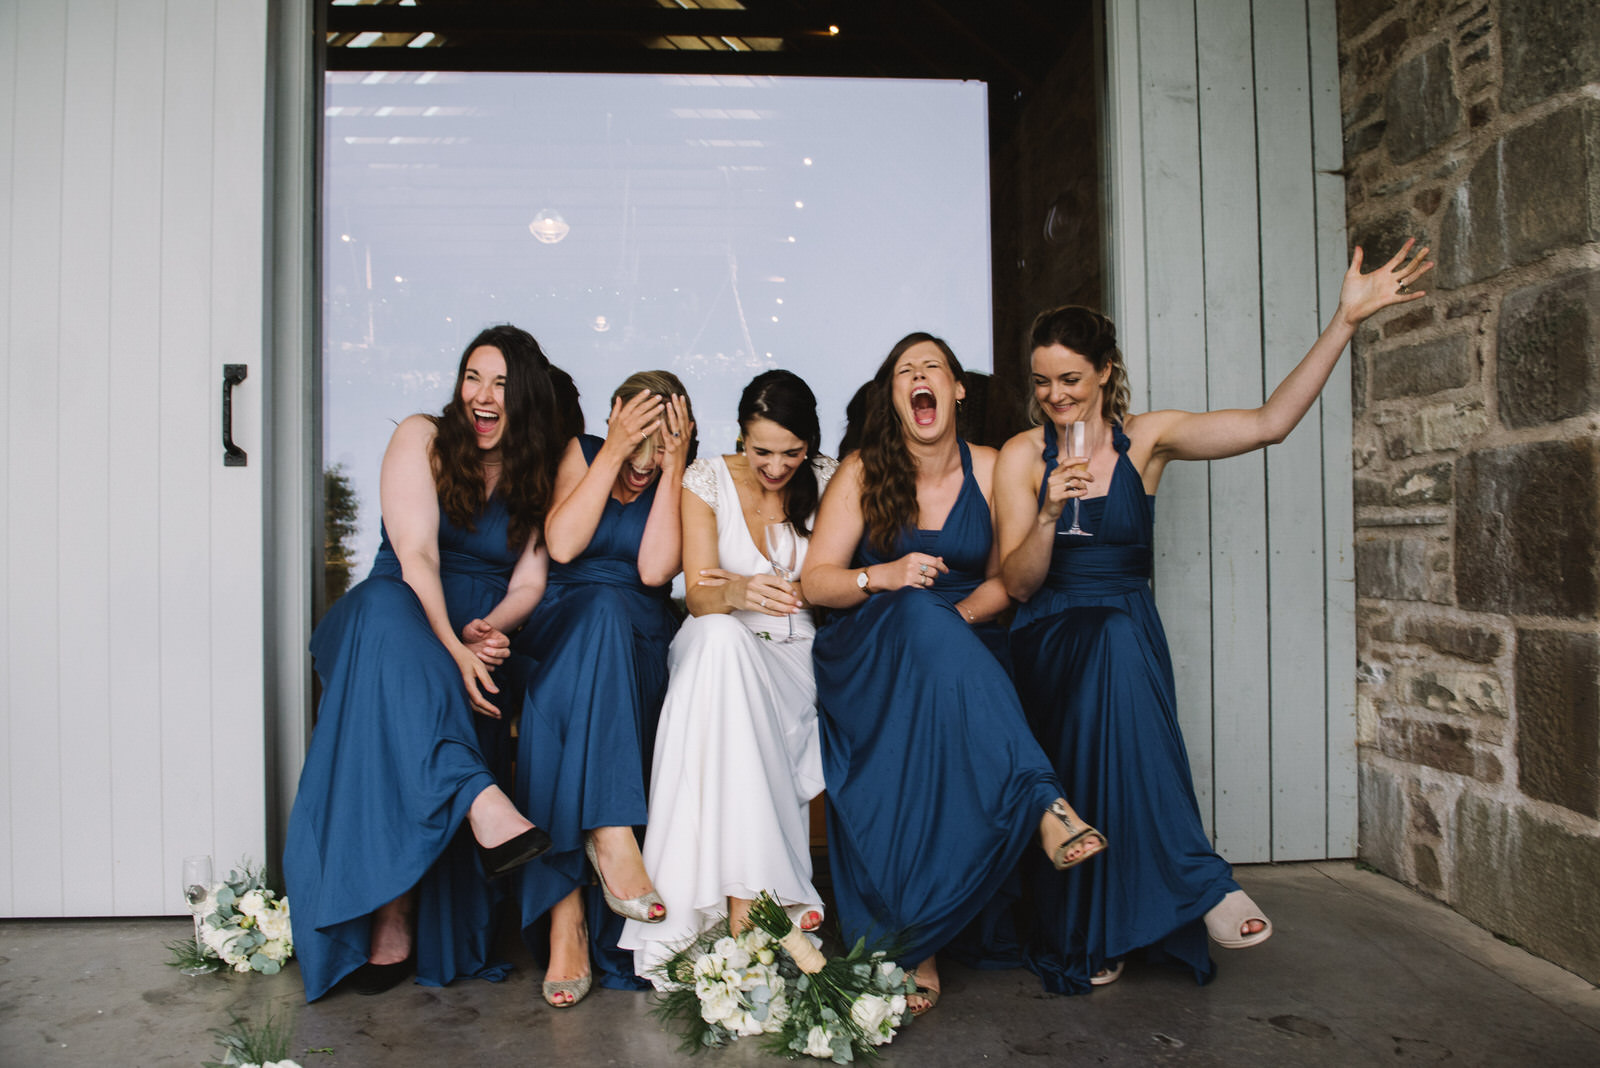 037-GUARDSWELL-FARM-WEDDING-ALTERNATIVE-SCOTTISH-WEDDING-PHOTOGRAPHER-SCOTTISH-WEDDING-DESTINATION-WEDDING-PHOTOGRAPHER.JPG